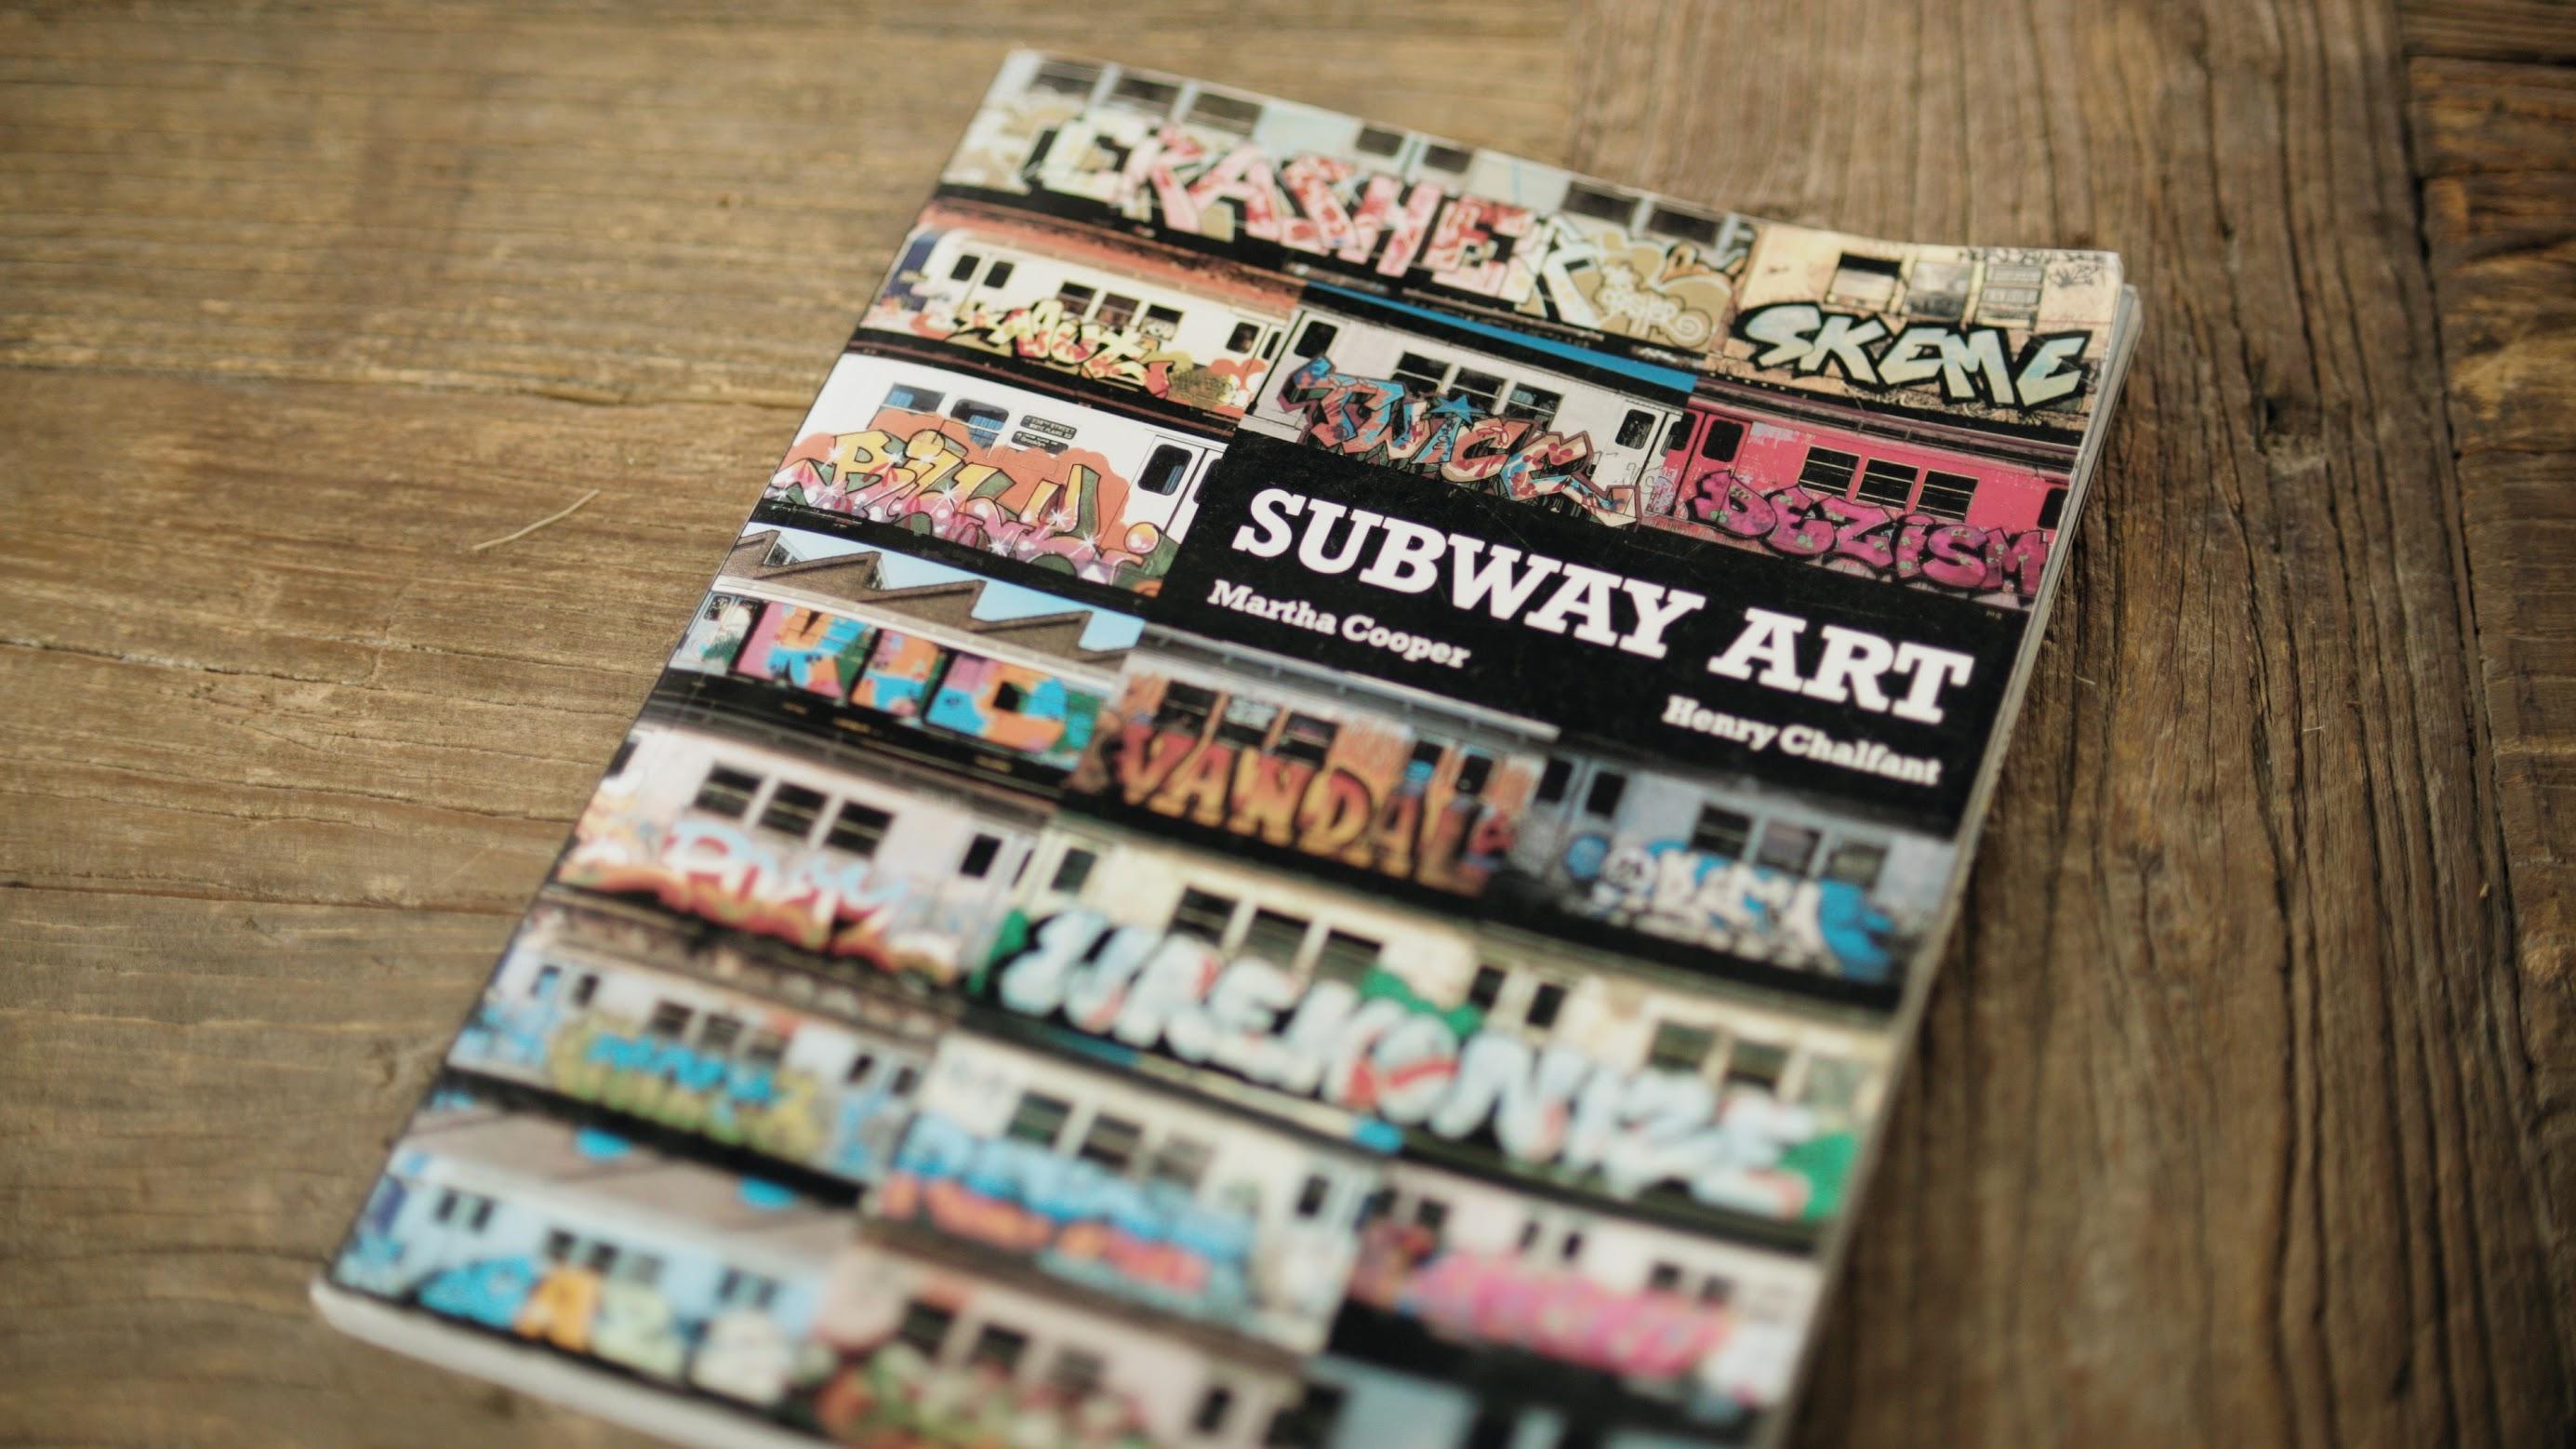 subway art by martha cooper